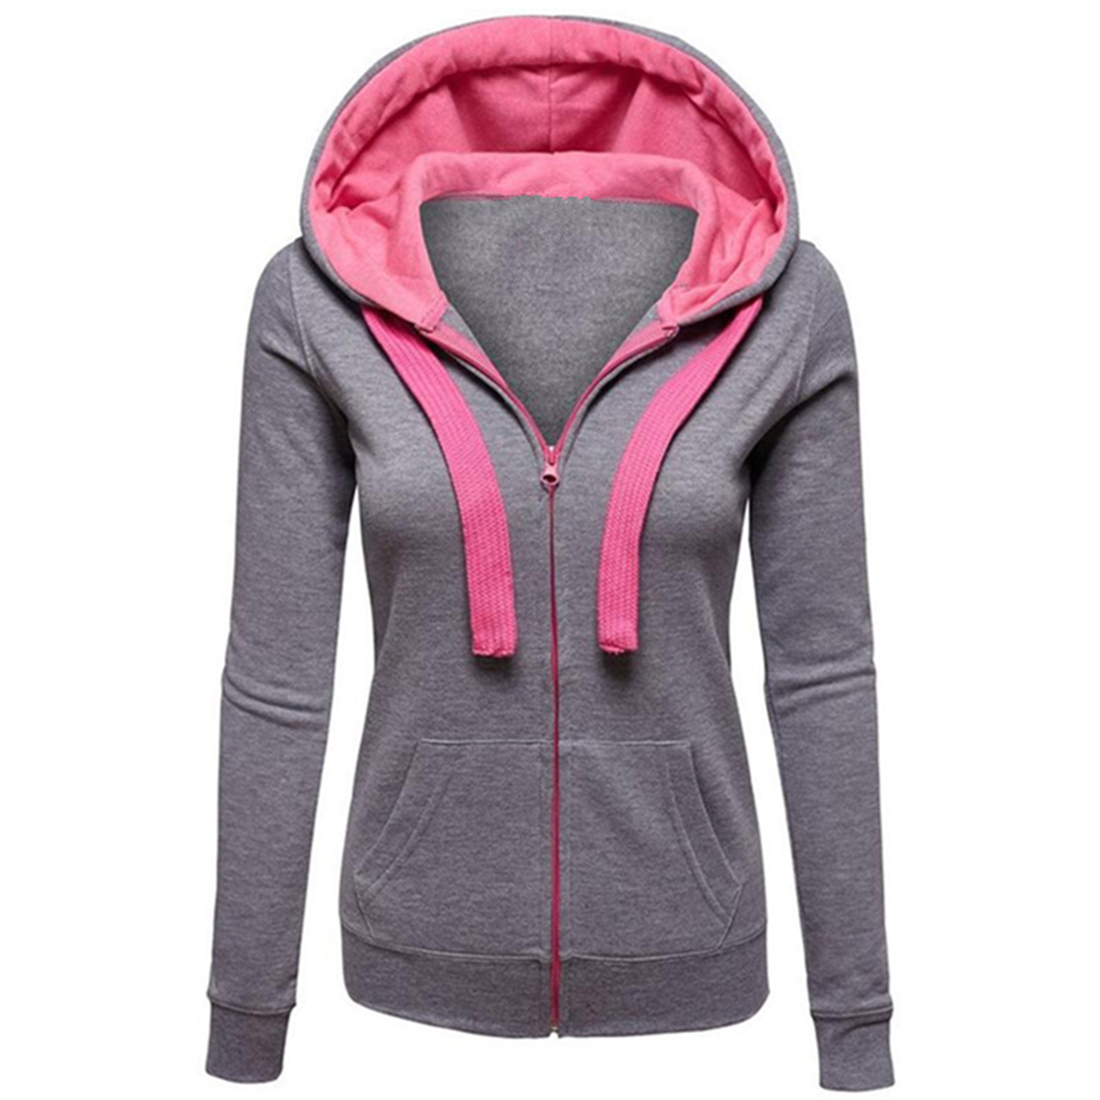 2017 Fashion Women Spring Hooded Zipper Sweatshirt Candy Colors Design Hoodies Casaul Long Sleeve Top Sweatshirt